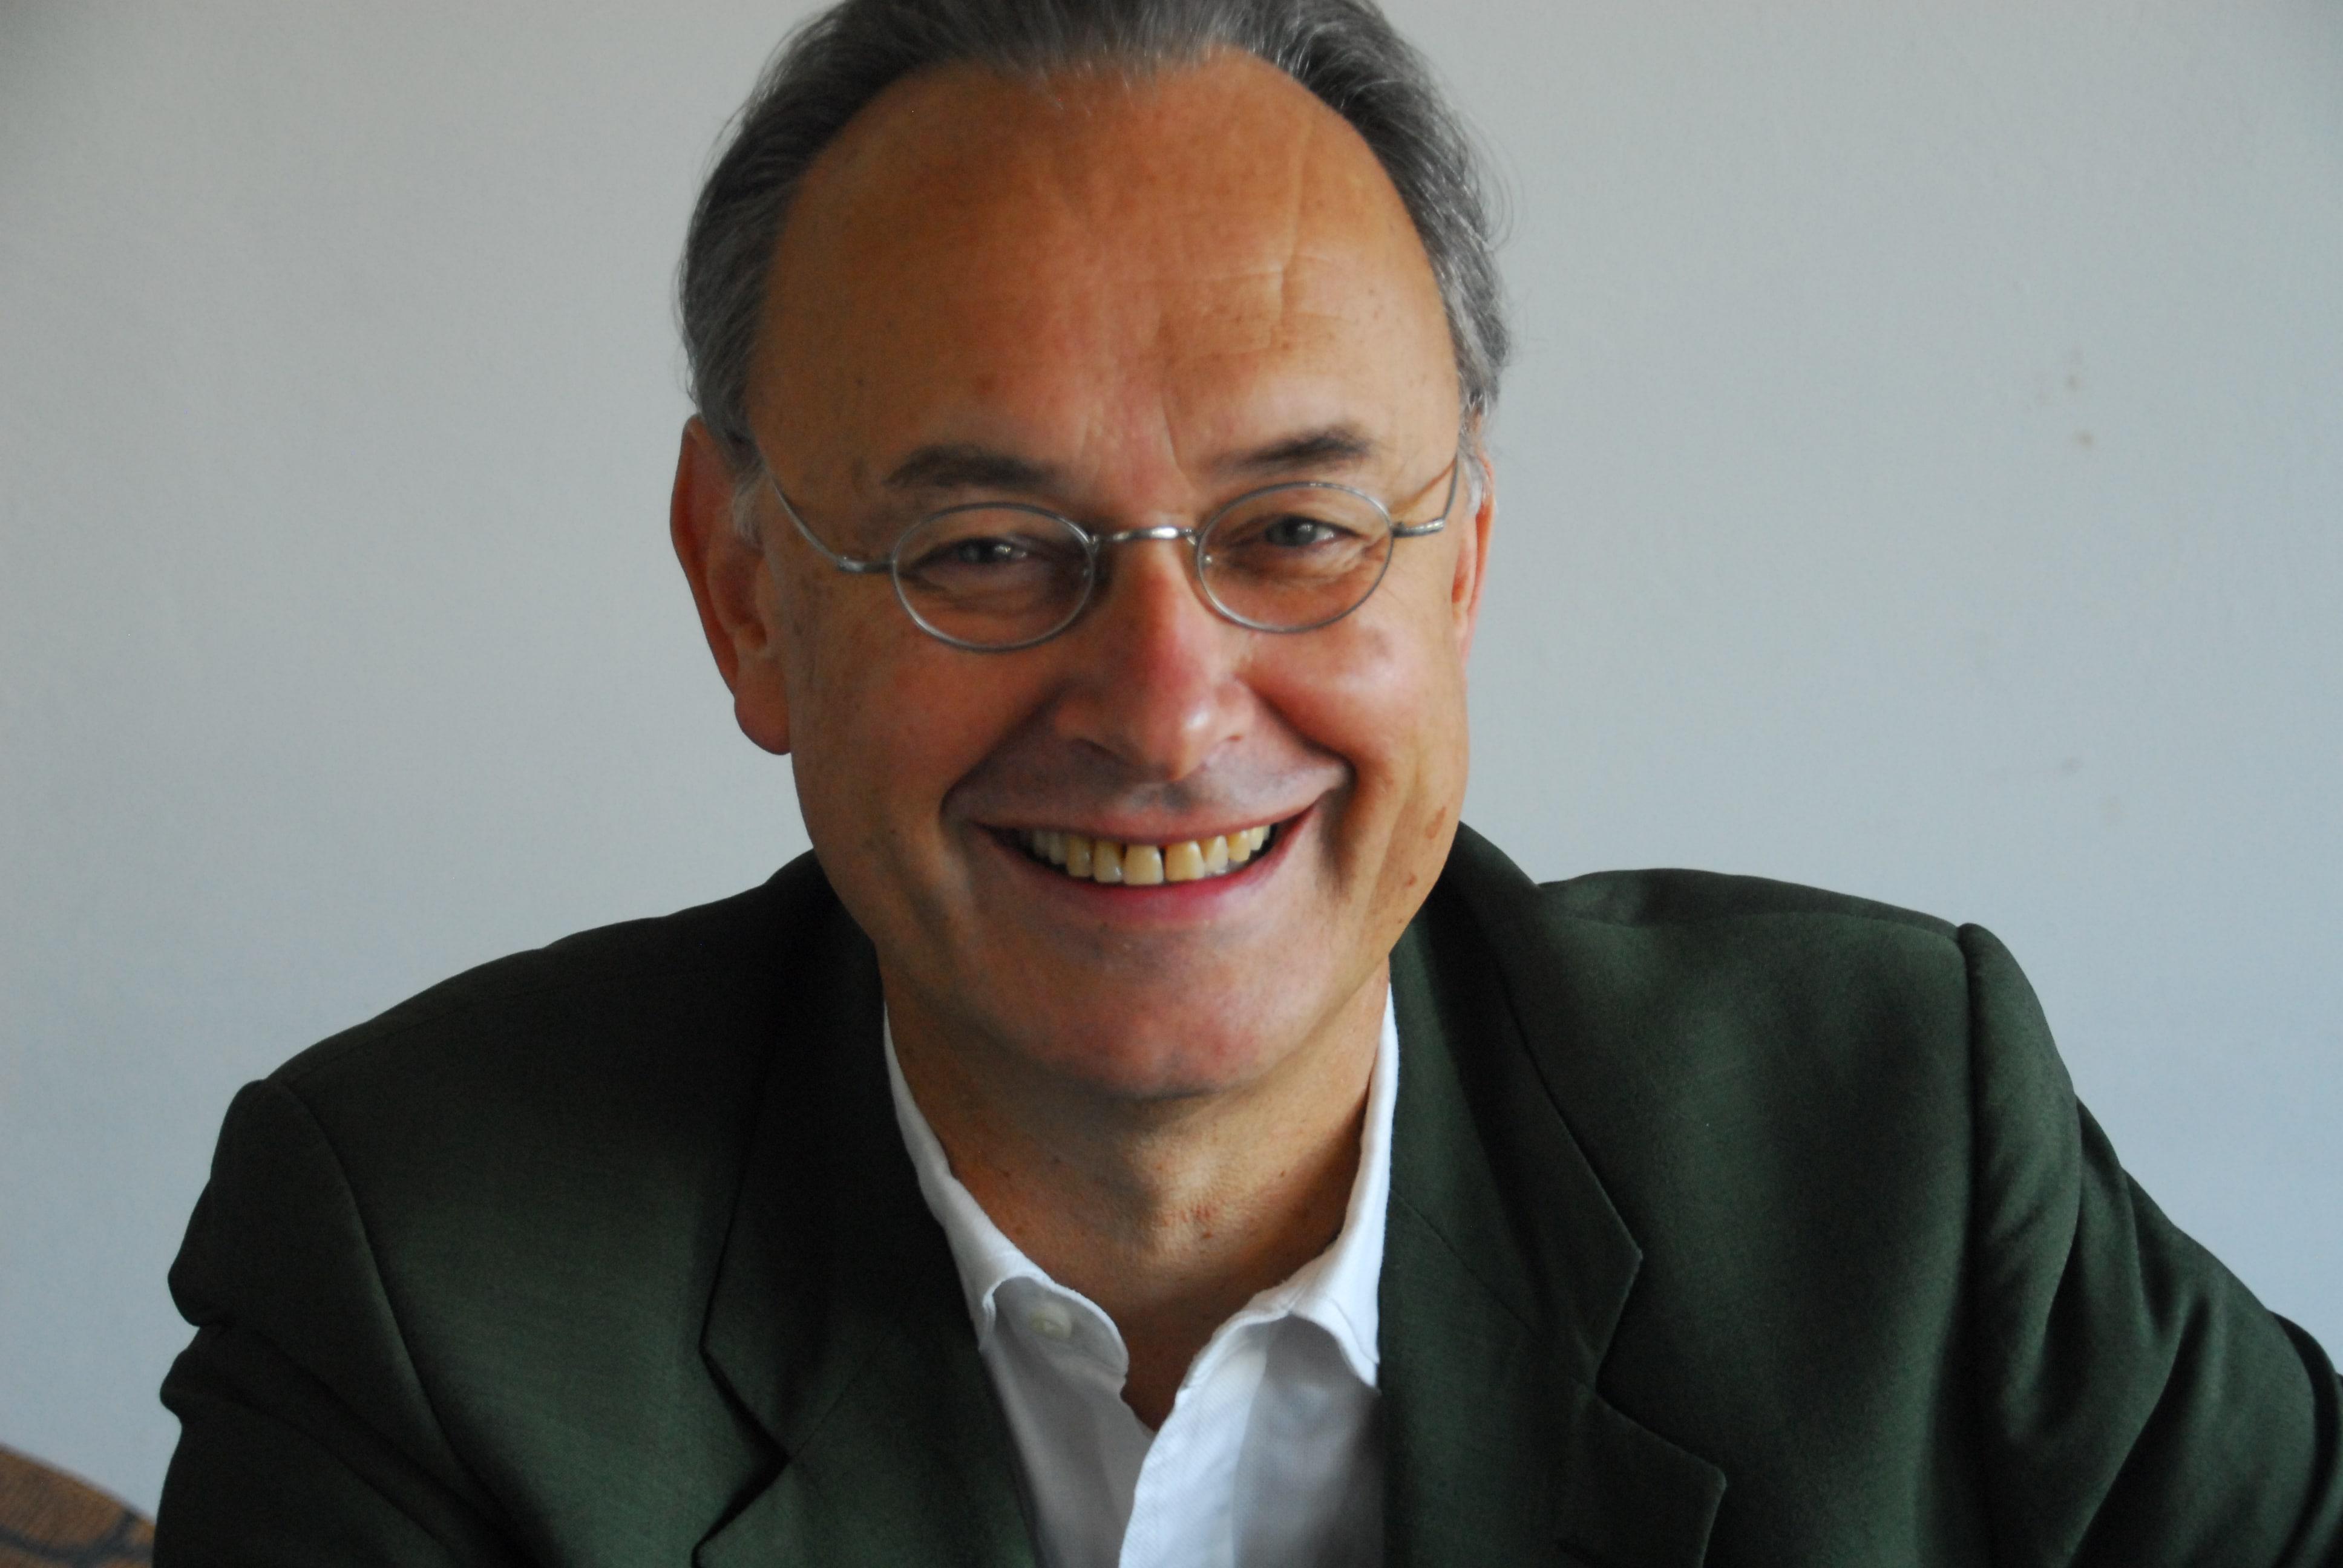 Alexander Unverzagt (c) Privat